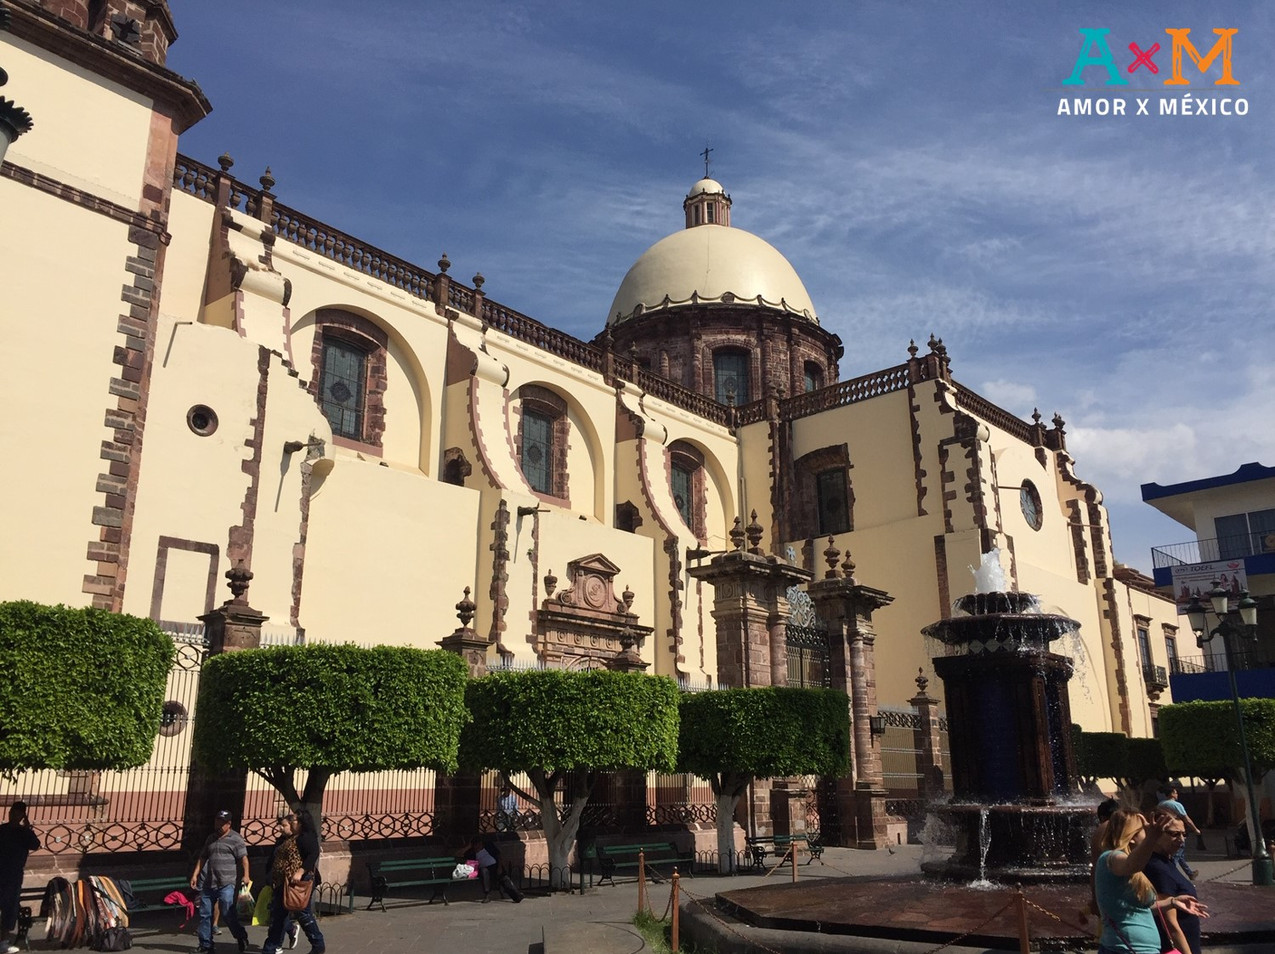 Fachada lateral de la Catedral de Zamora, frente al mercado de dulces